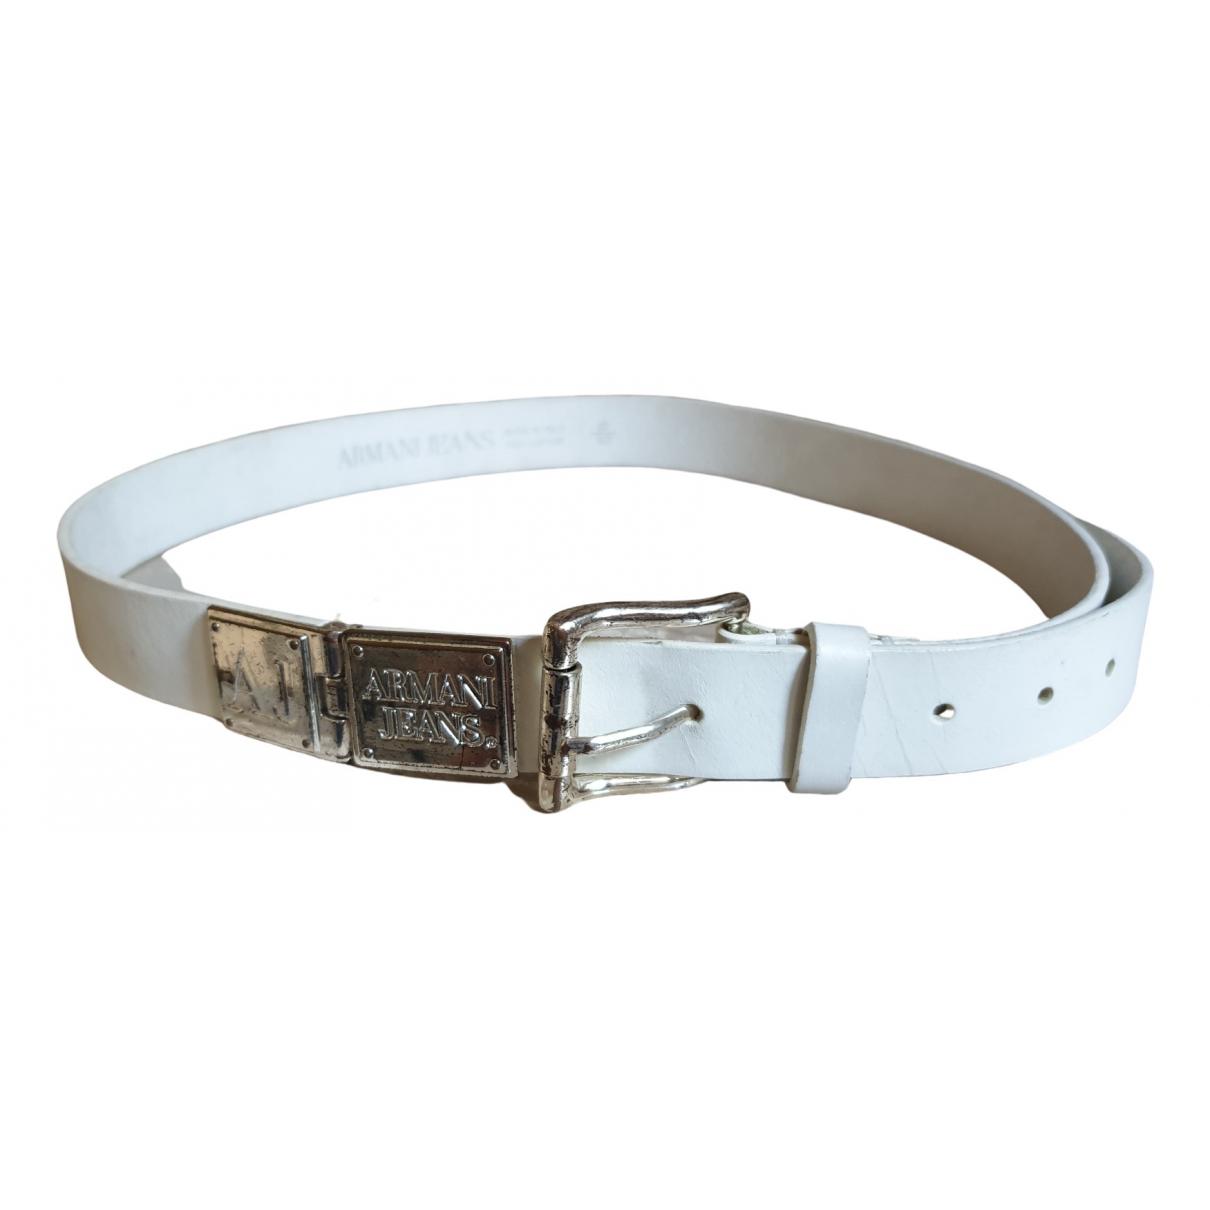 Armani Jeans \N White Leather belt for Women M International